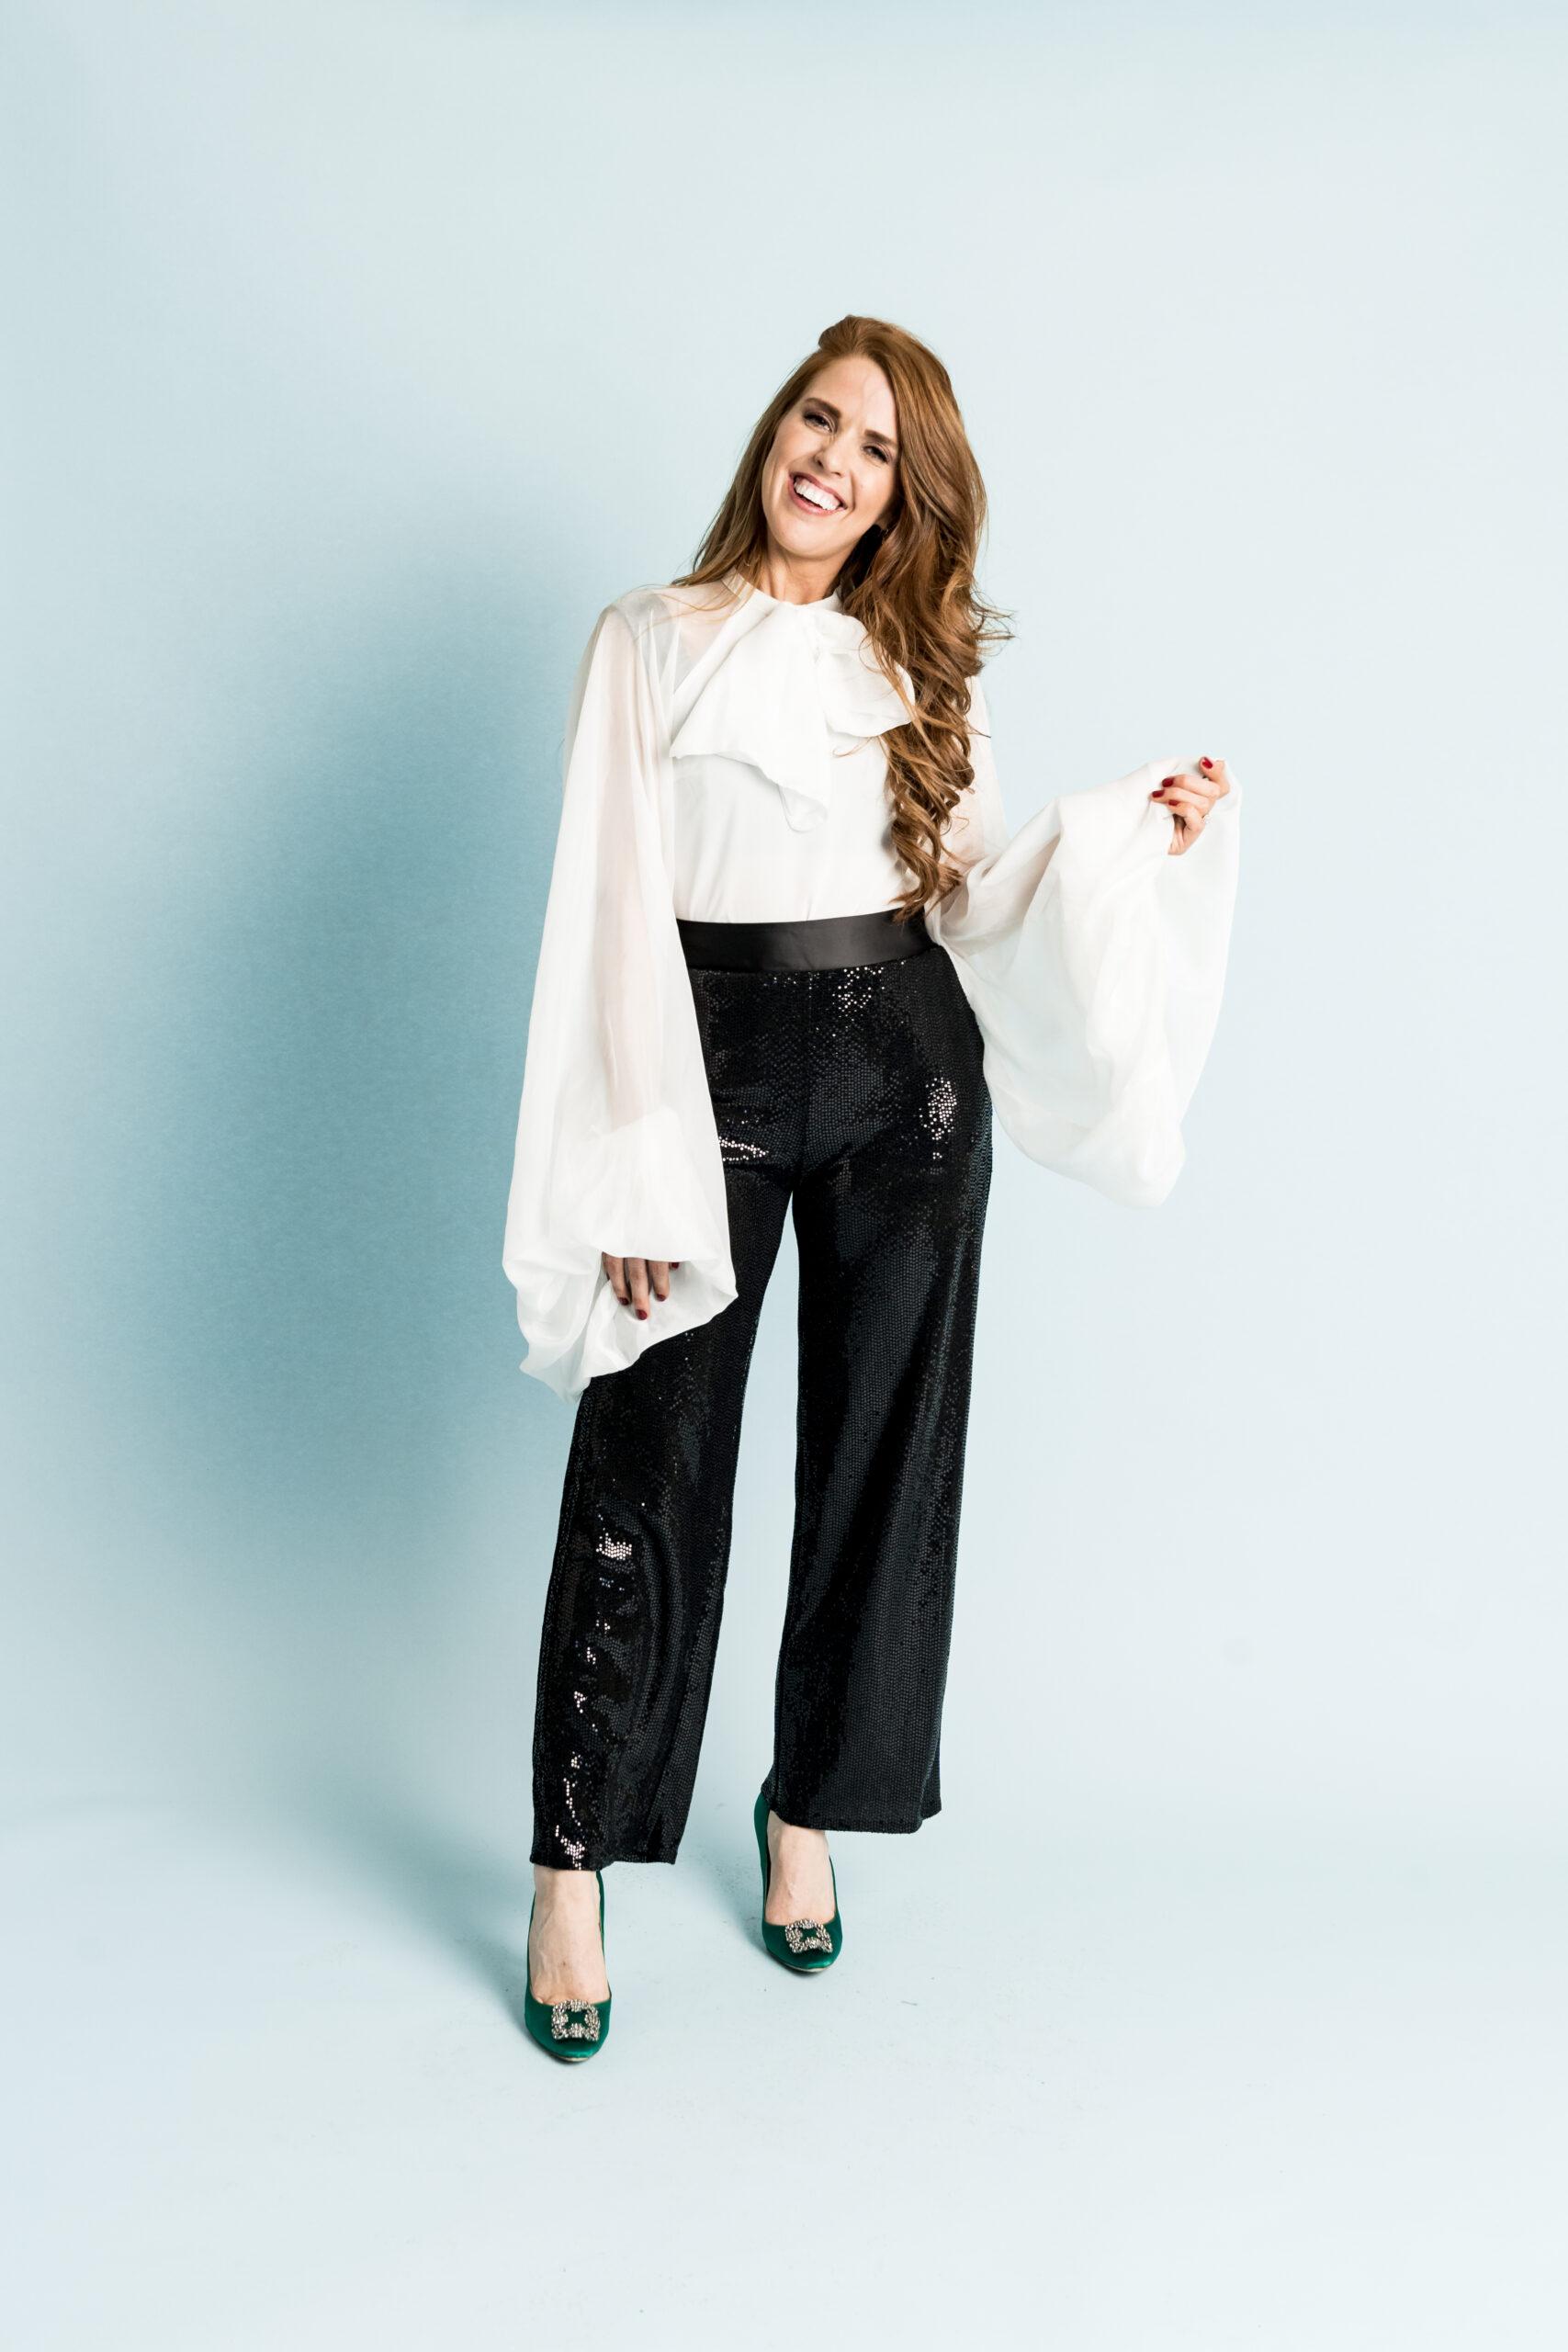 Tara Gibson Wide Leg Sequin Pant